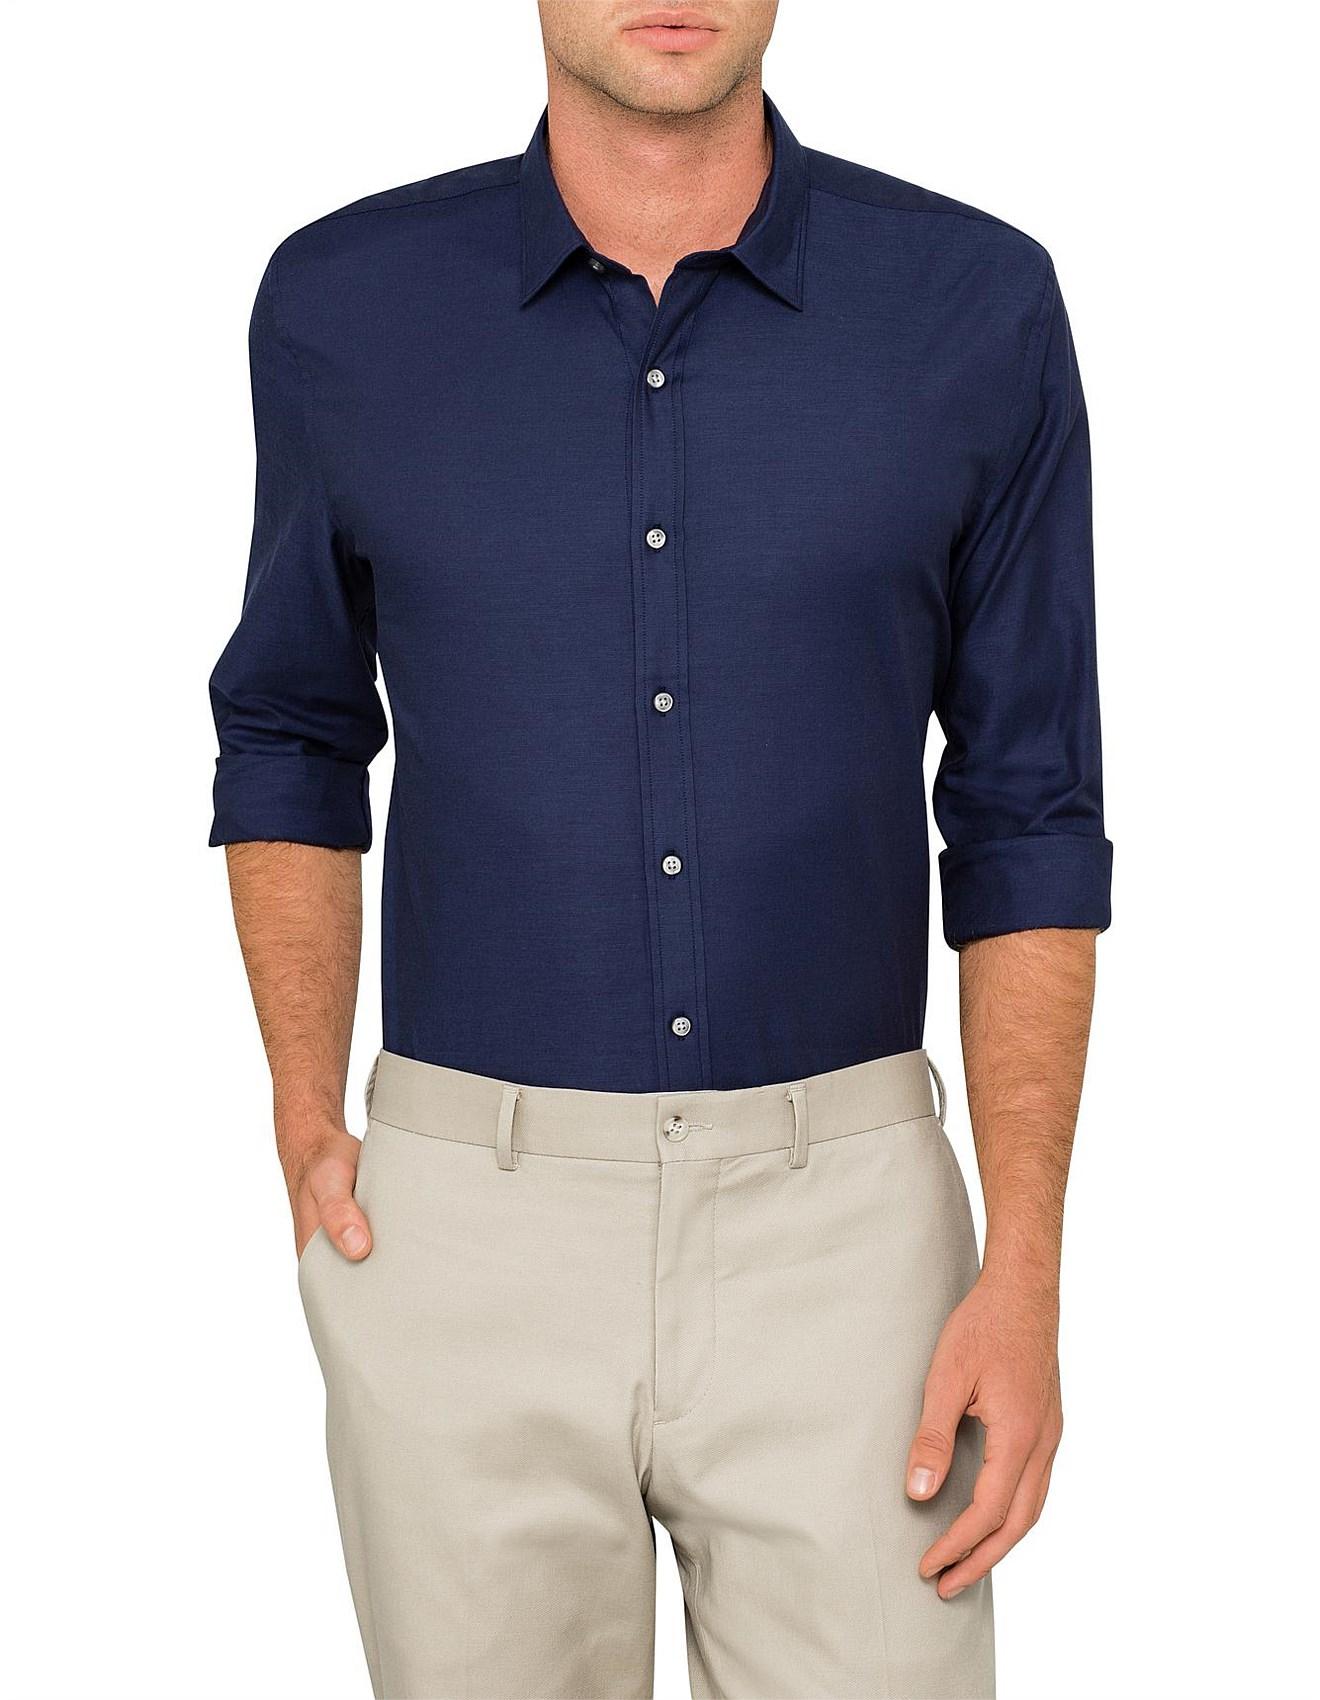 Classic Fit Twill Shirt - ralphlauren.com